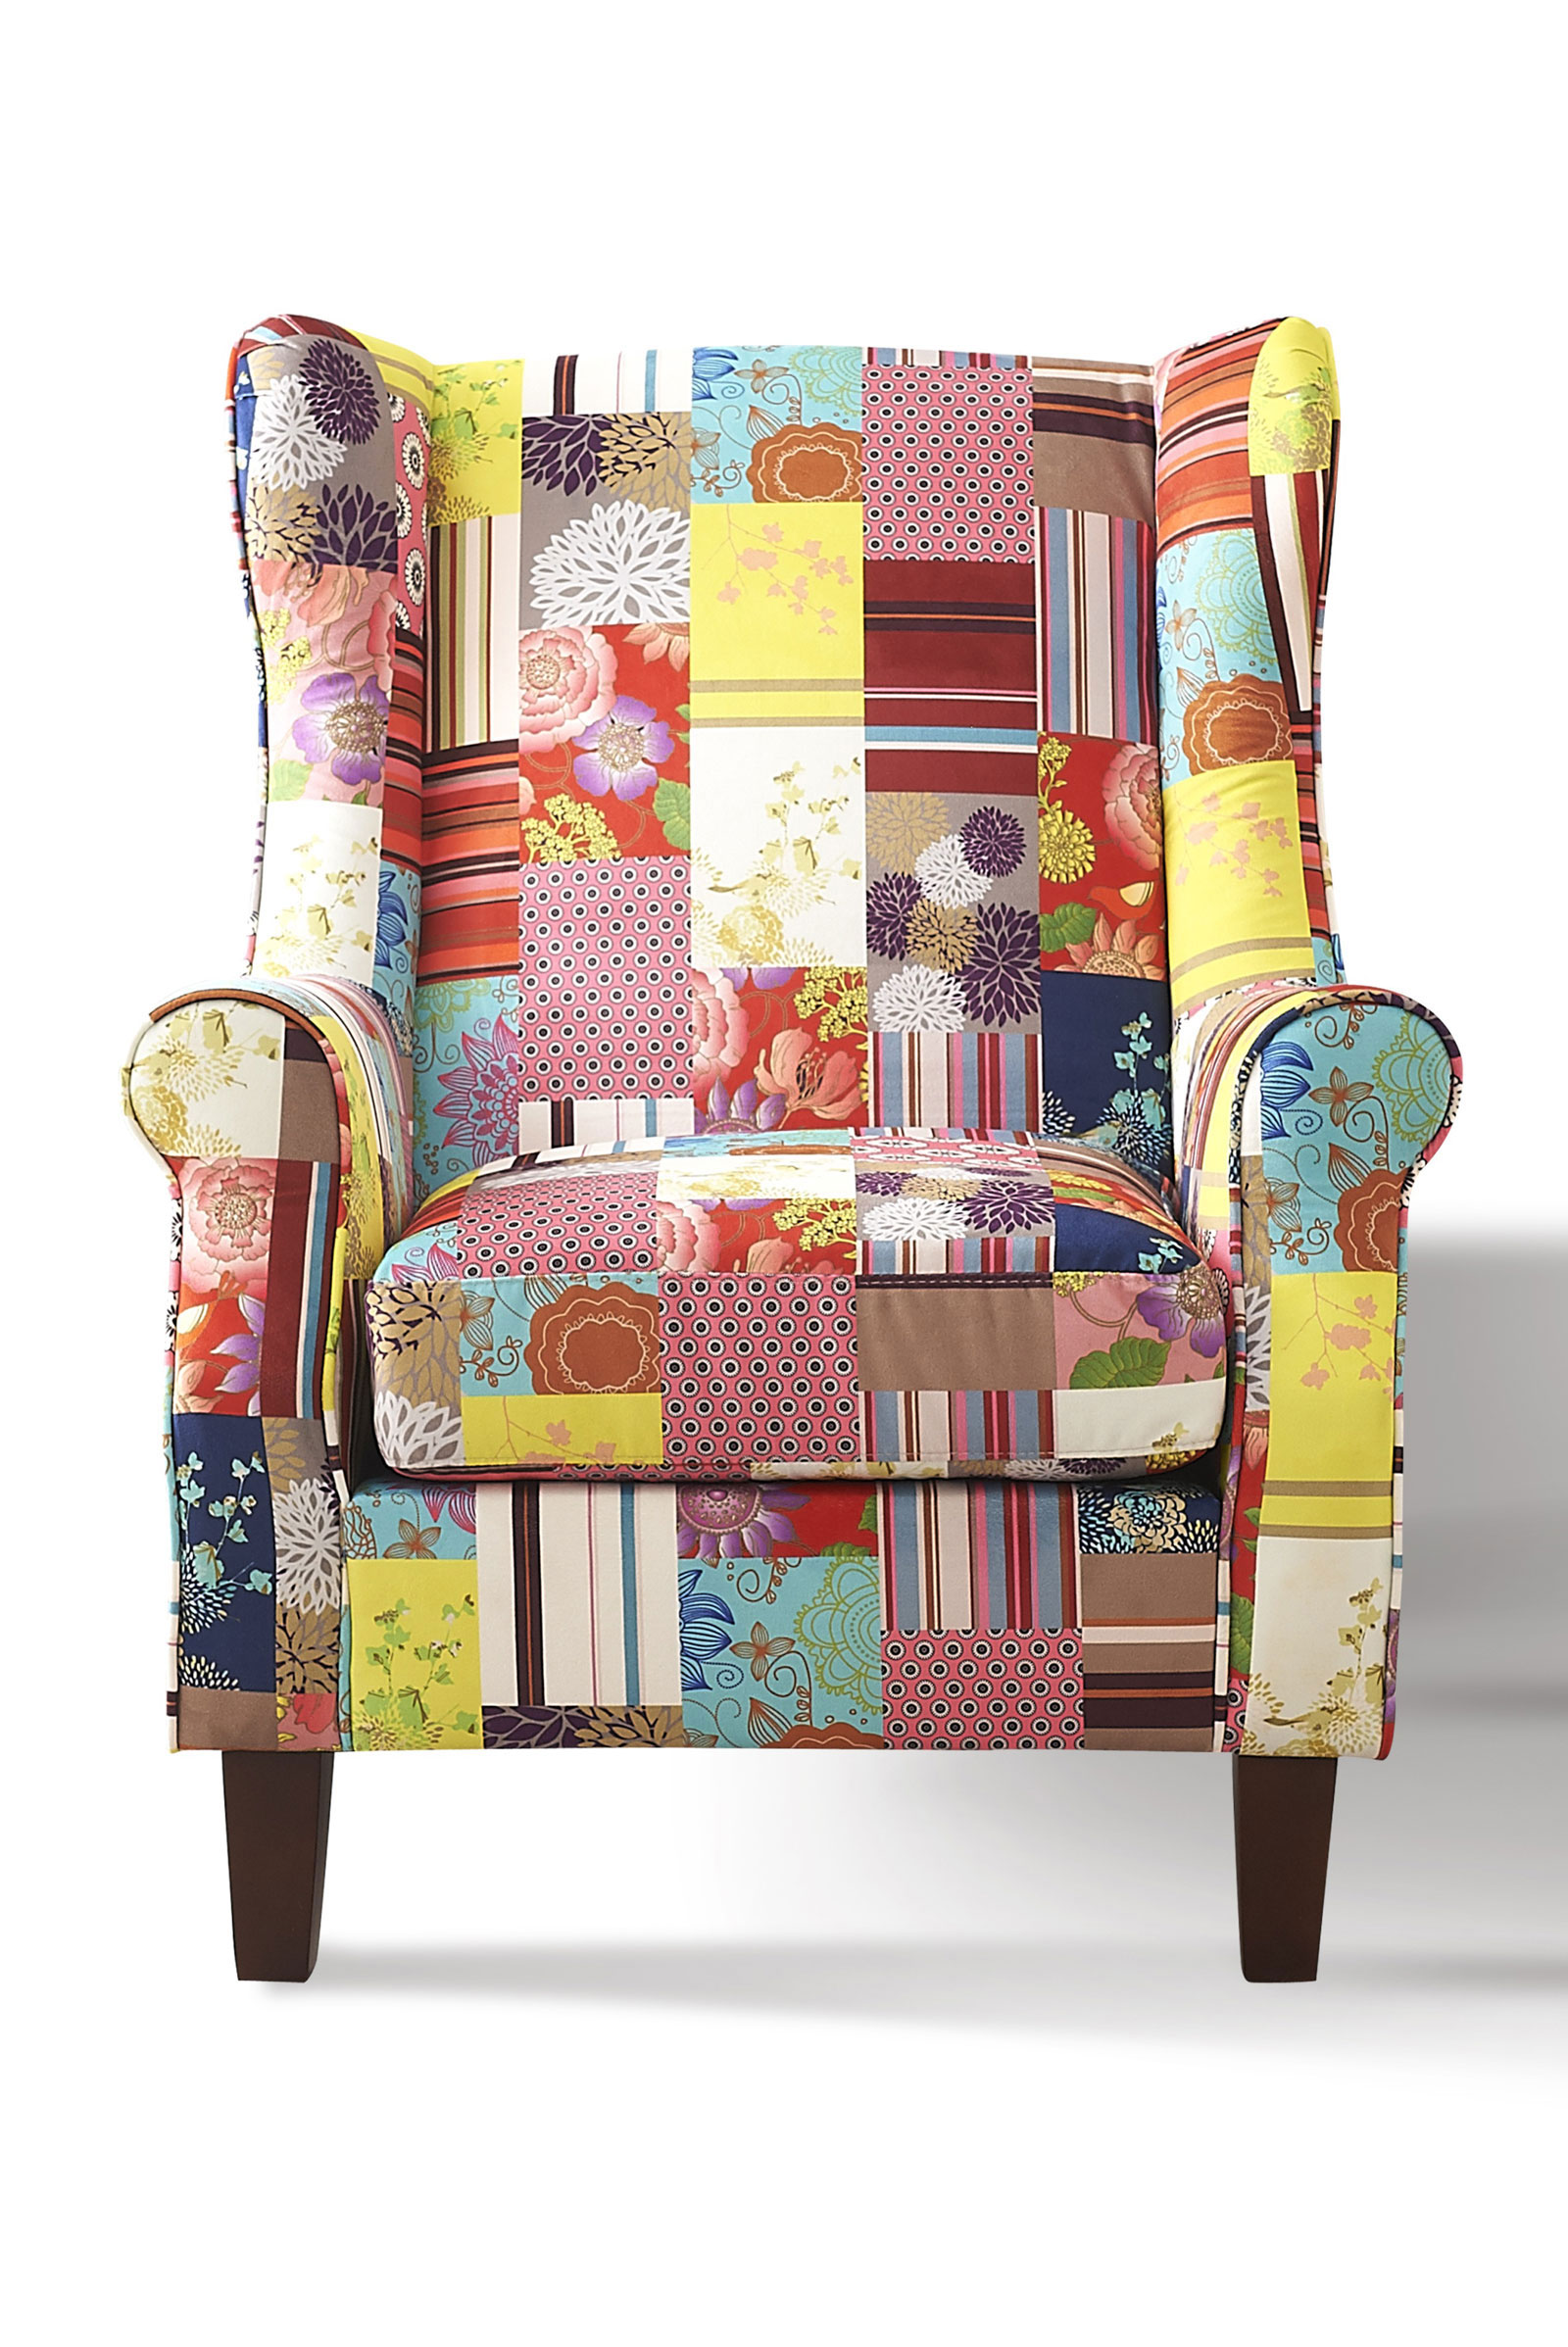 Sam armlehnsessel mit hocker bunt flower 4715 30 sit for Sessel bunt mit hocker